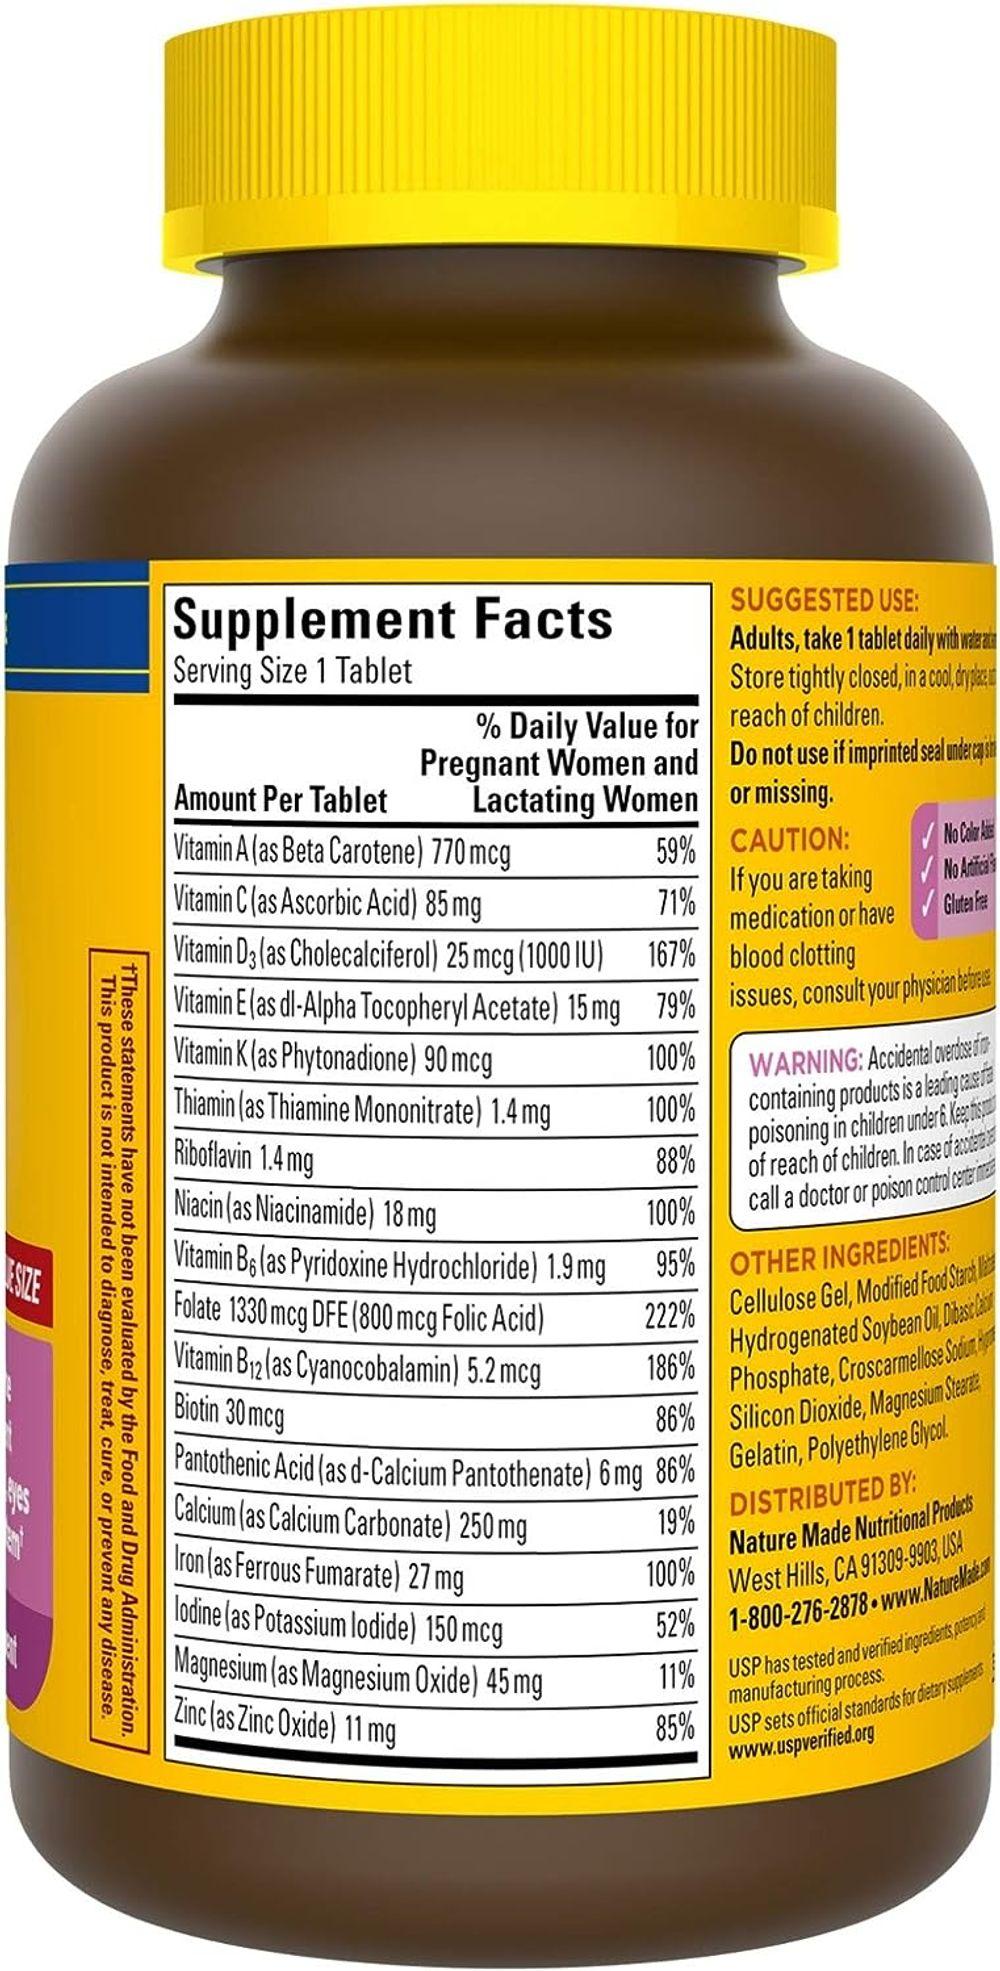 Nature Made Prenatal Multi, 250 Tablets, Folic Acid + 17 Prenatal Vitamins & Minerals to Support Baby Development and Mom, Vitamin D3, Calcium, Iron, Iodine, Vitamin C, and More